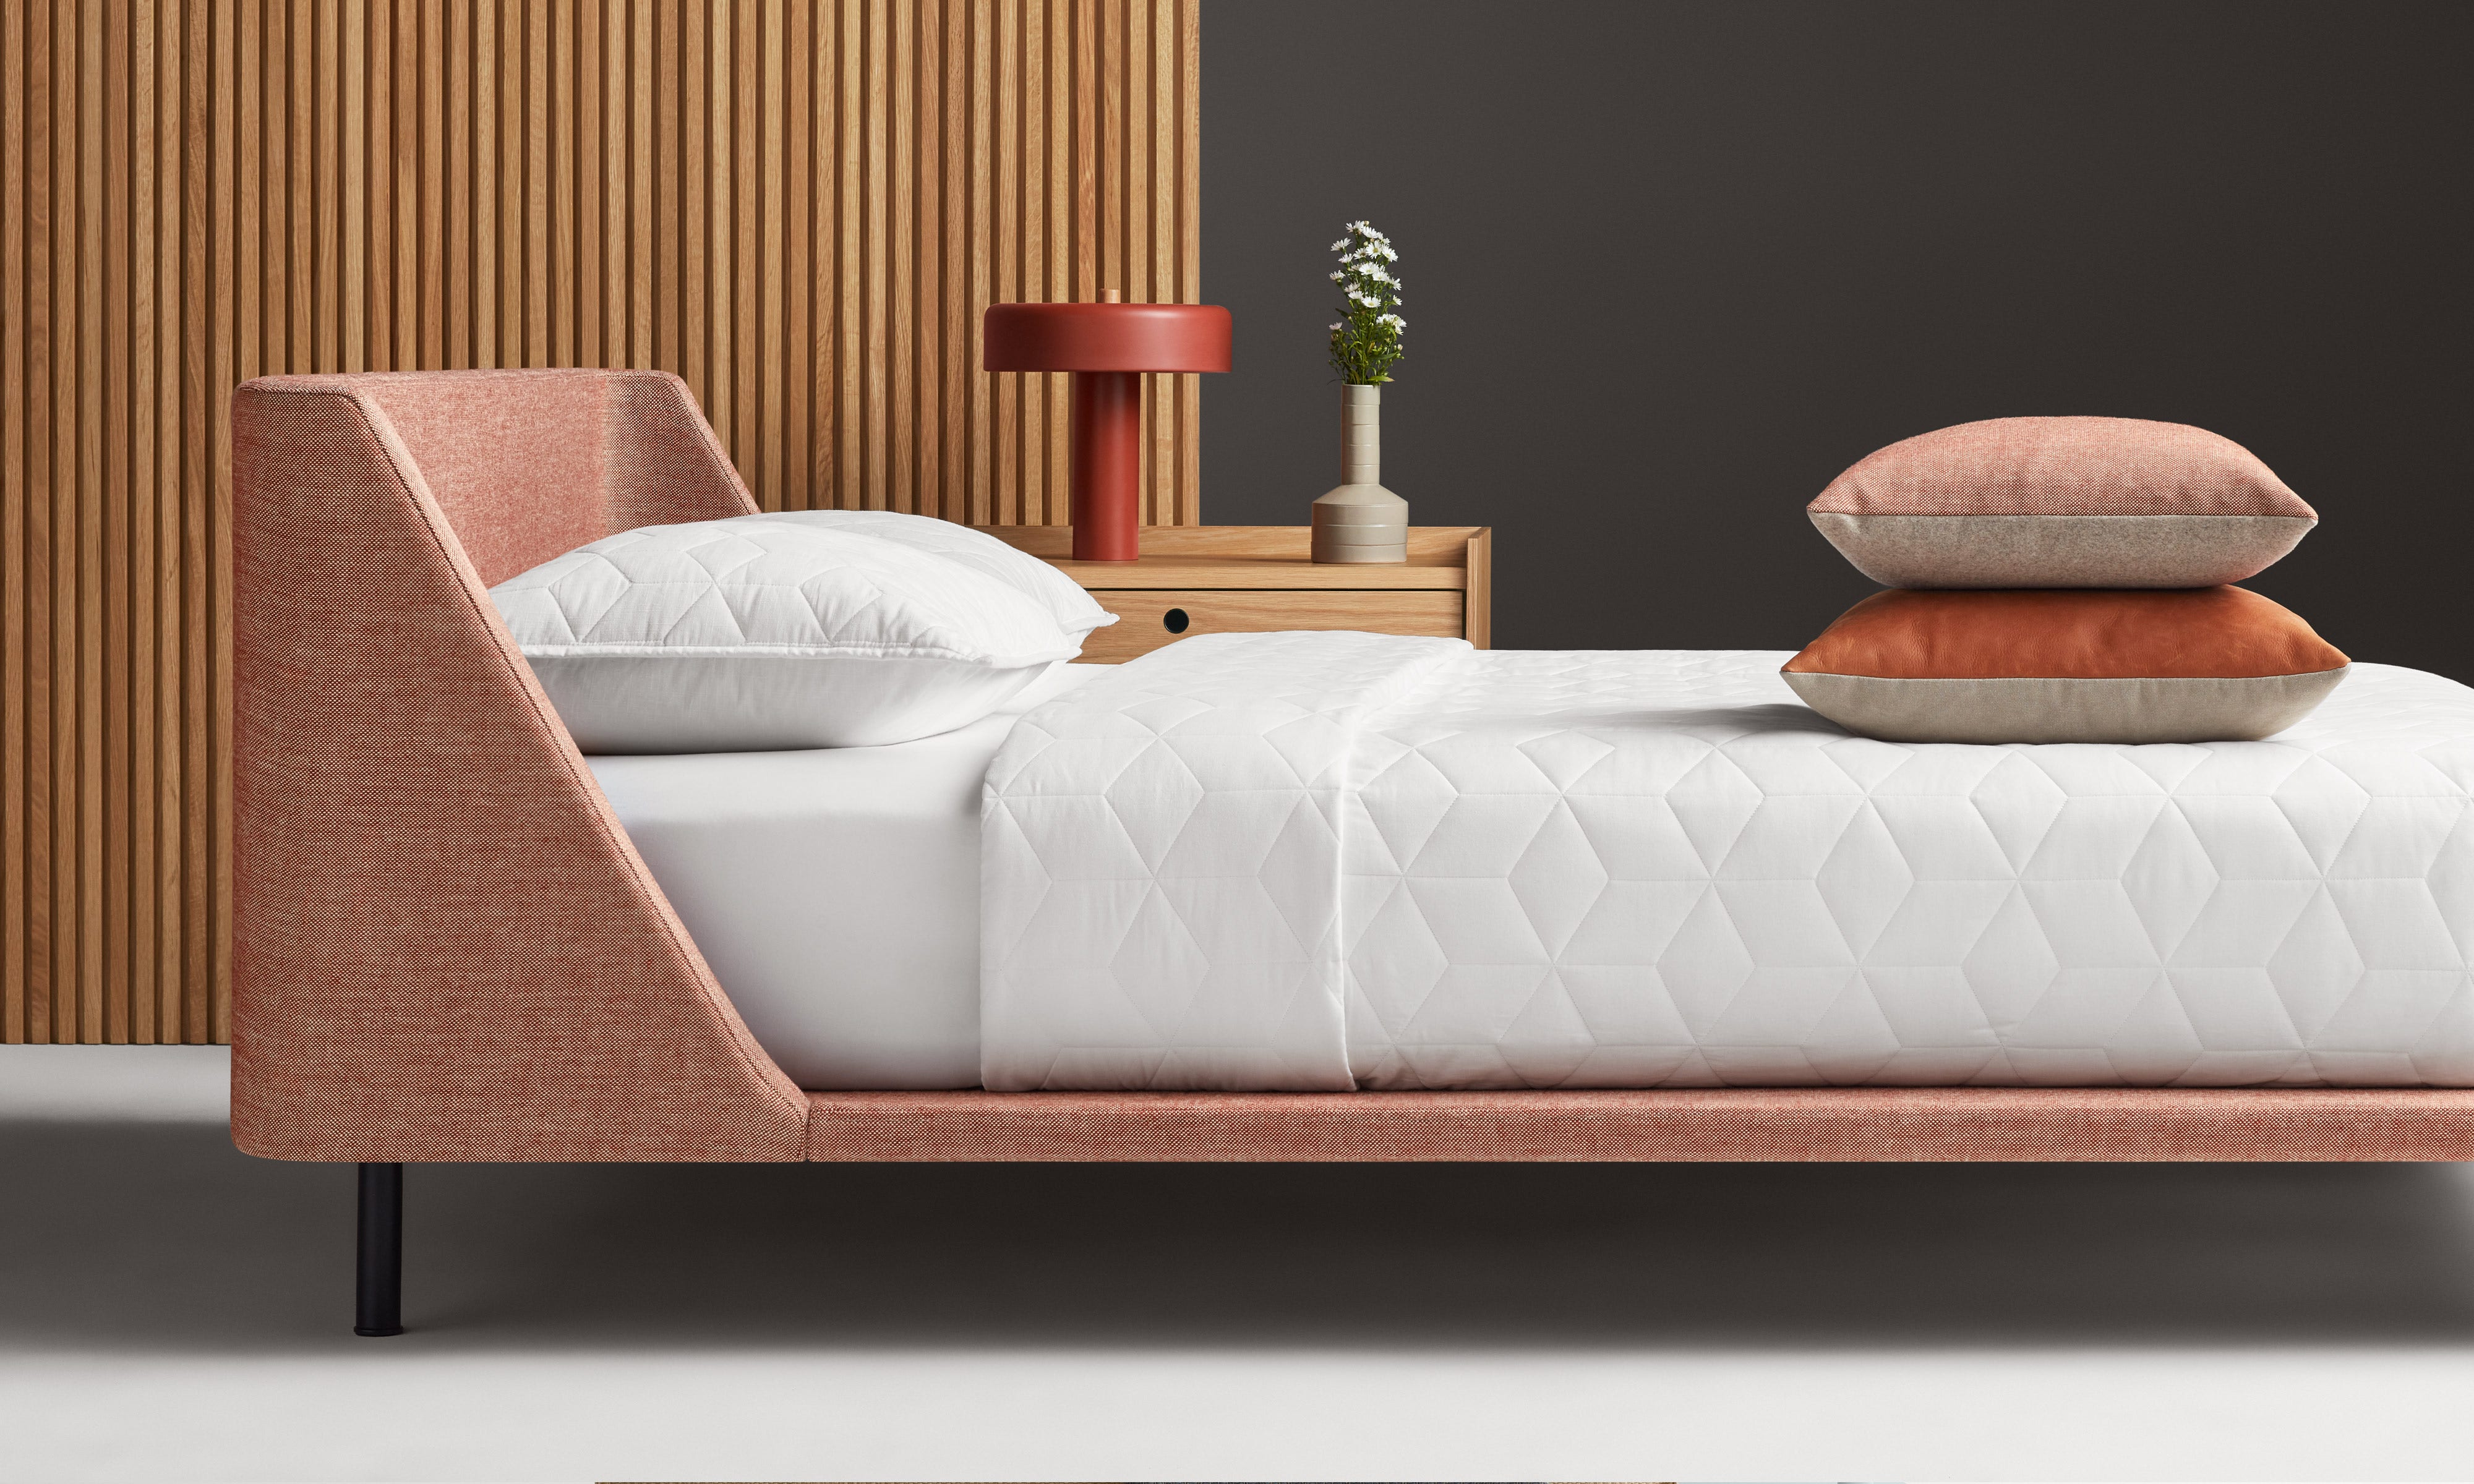 Nook Full Bed